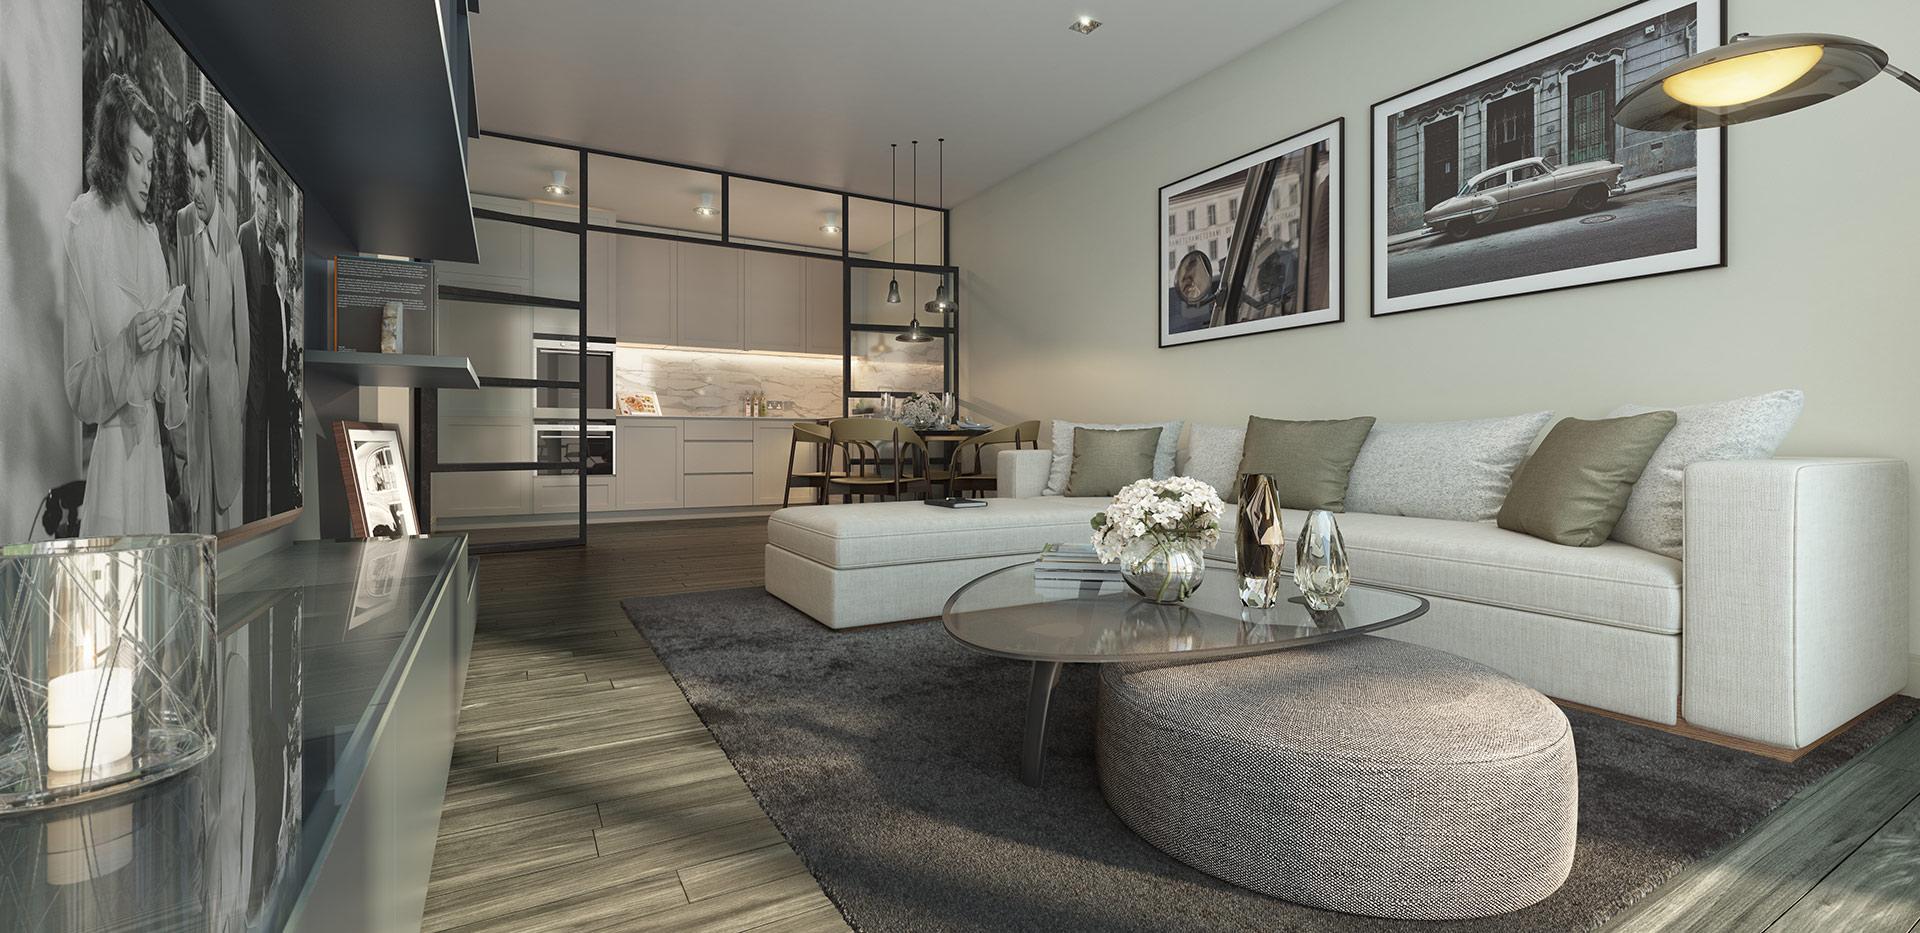 Berkeley, Chiswick Gate, Apartments, Living, Internal